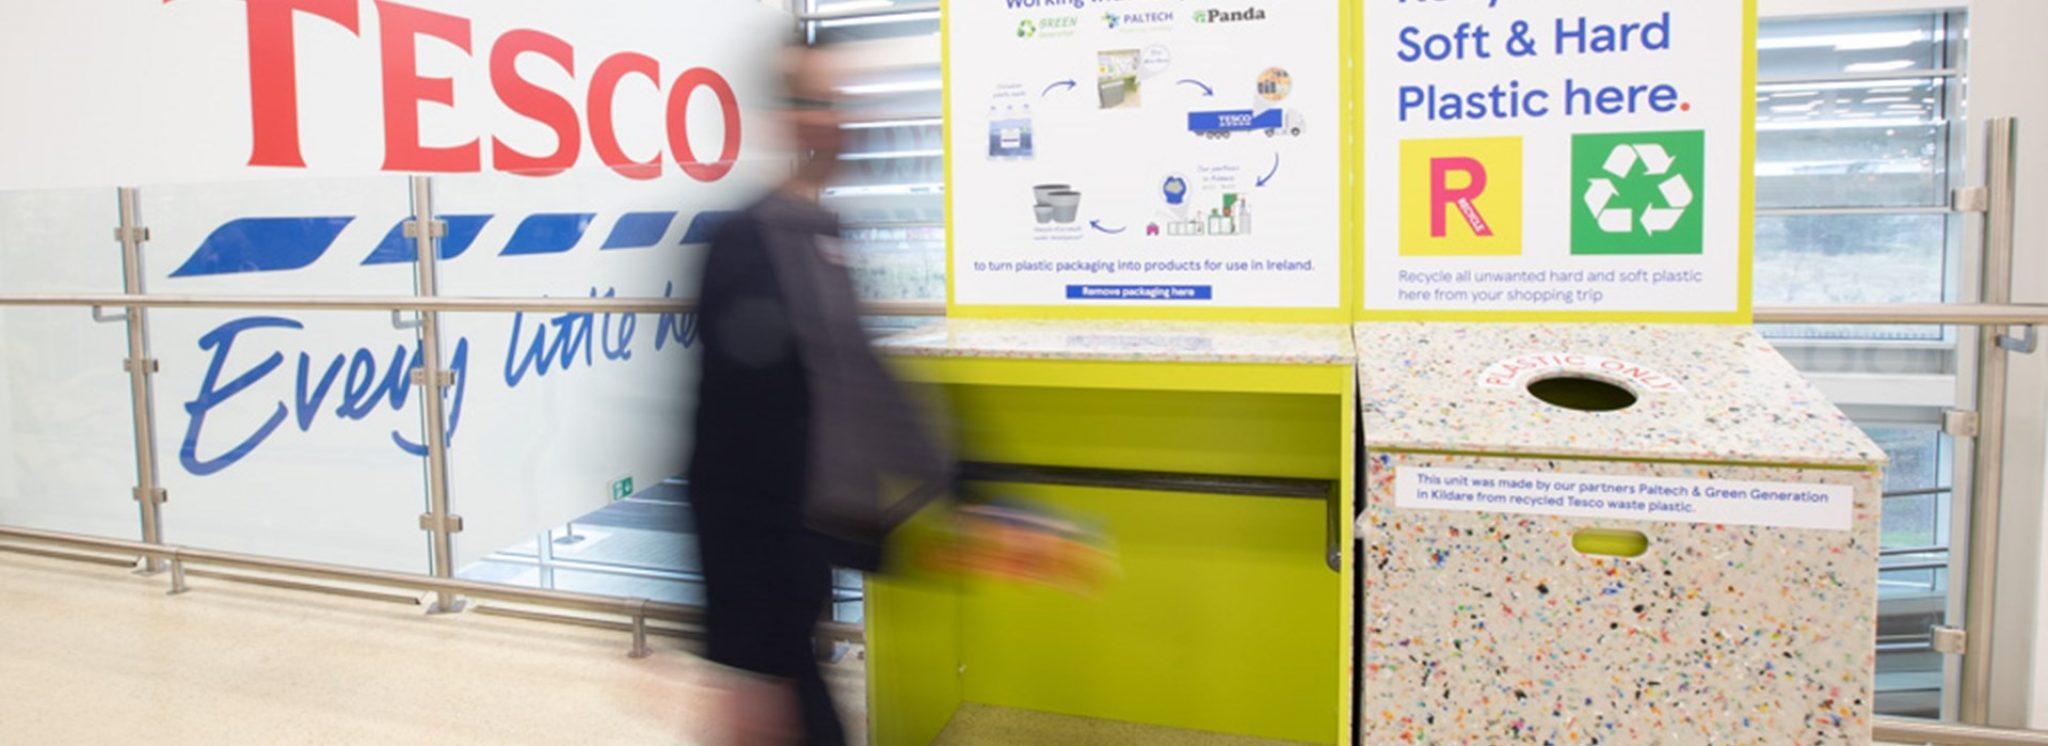 Tesco Ireland announces new recycling initiative